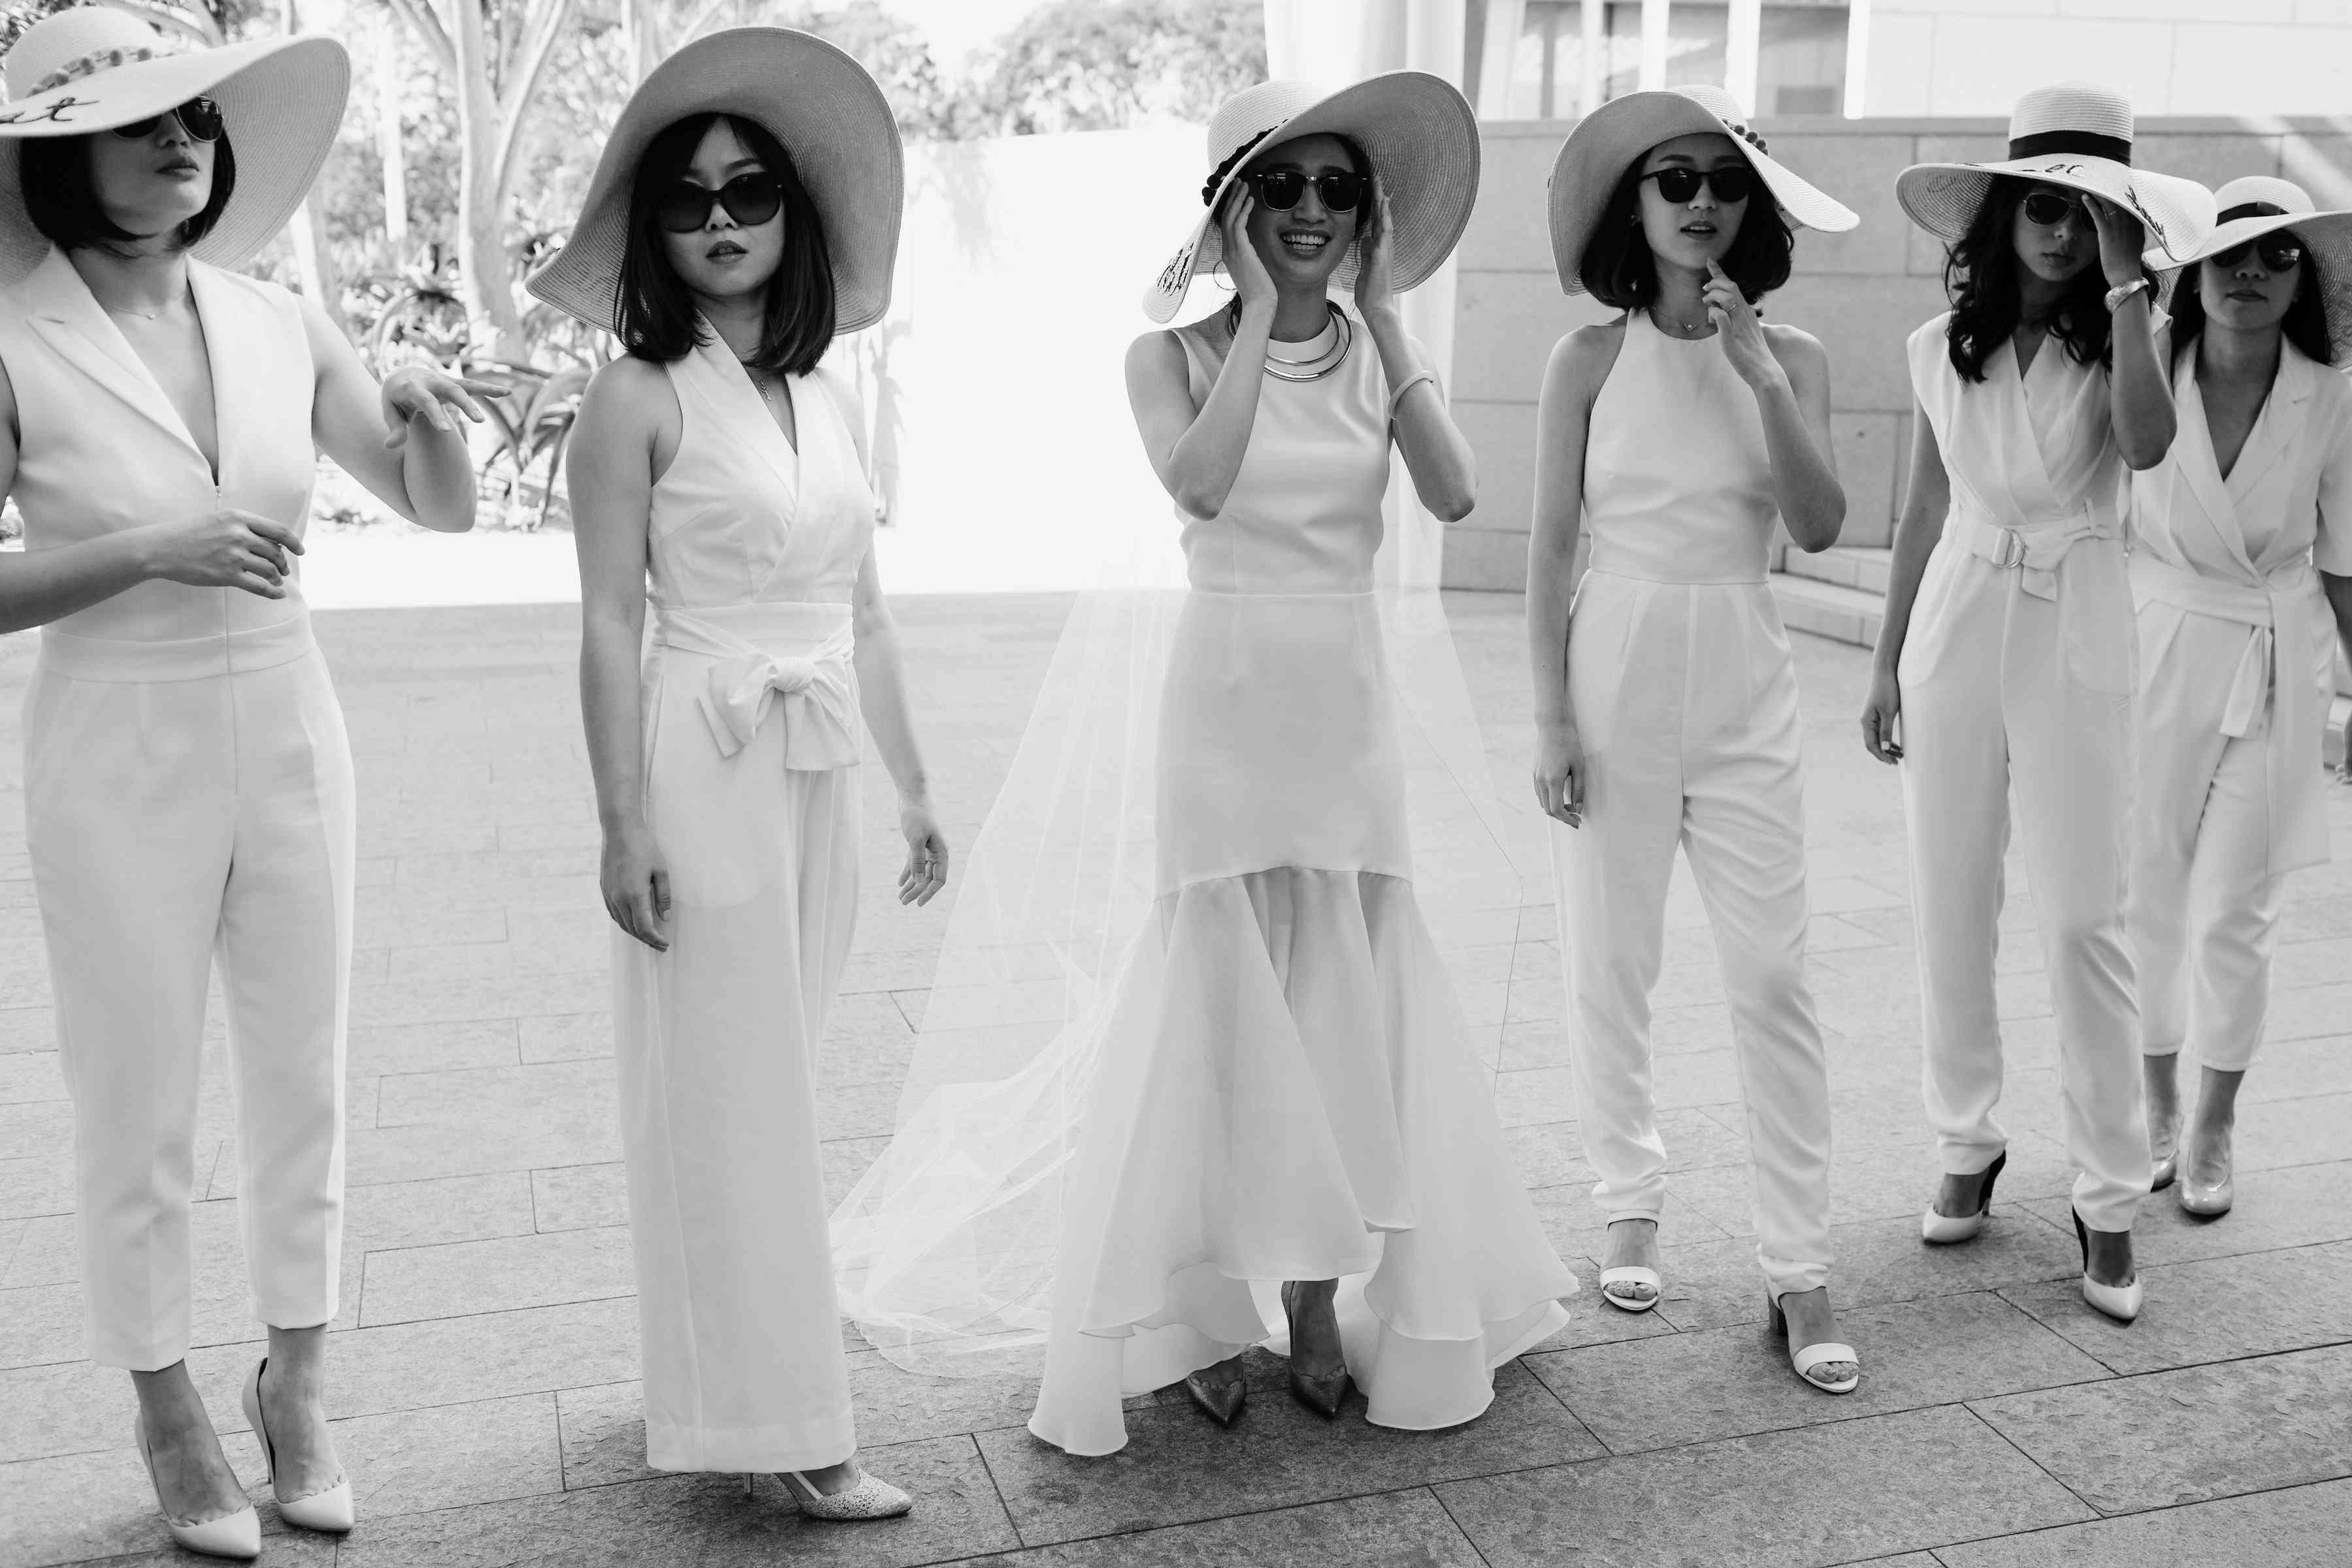 Bride with bridesmaids in hats